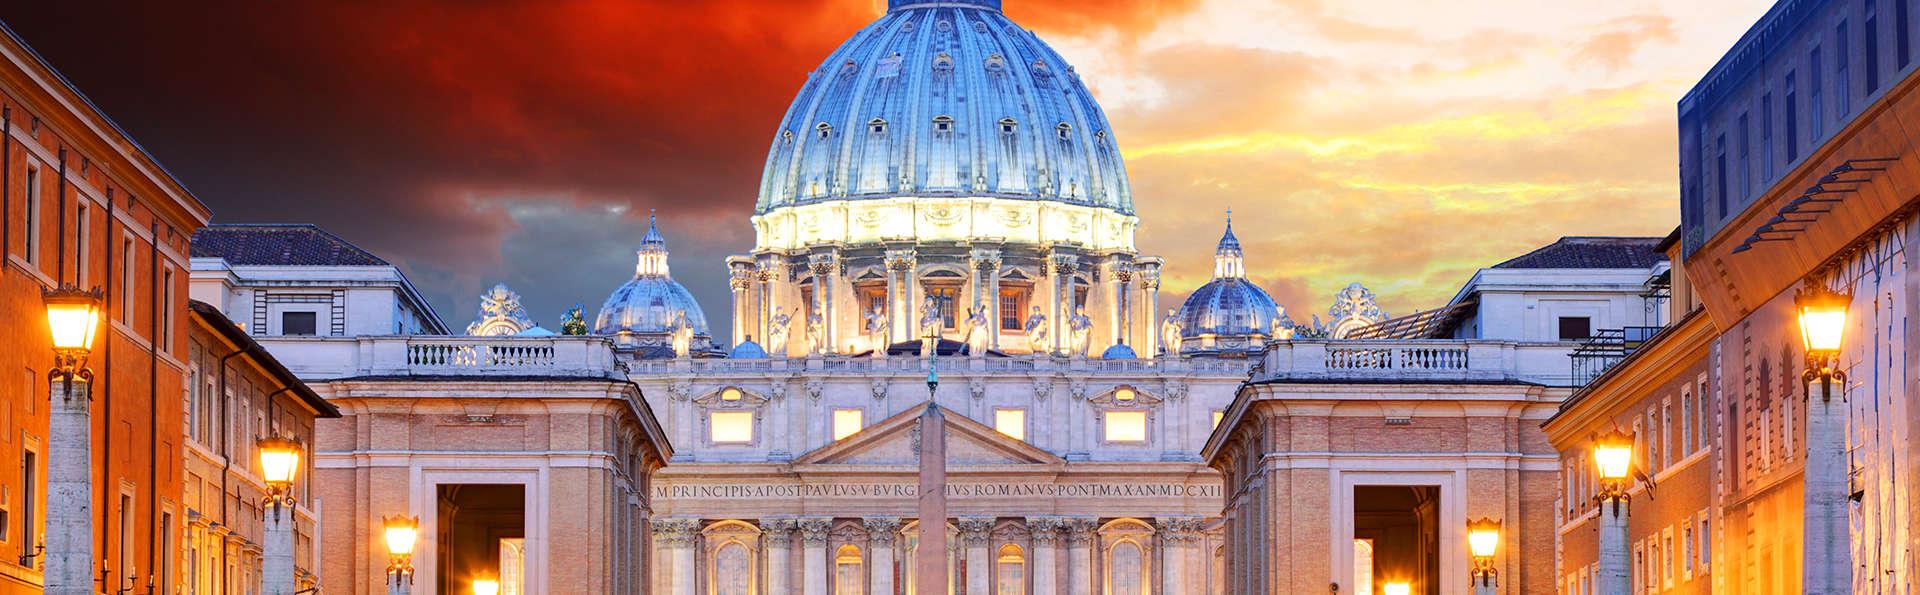 In Hotel XX Settembre - edit_Fotolia_67727736_St.-Peter-Basilica.jpg